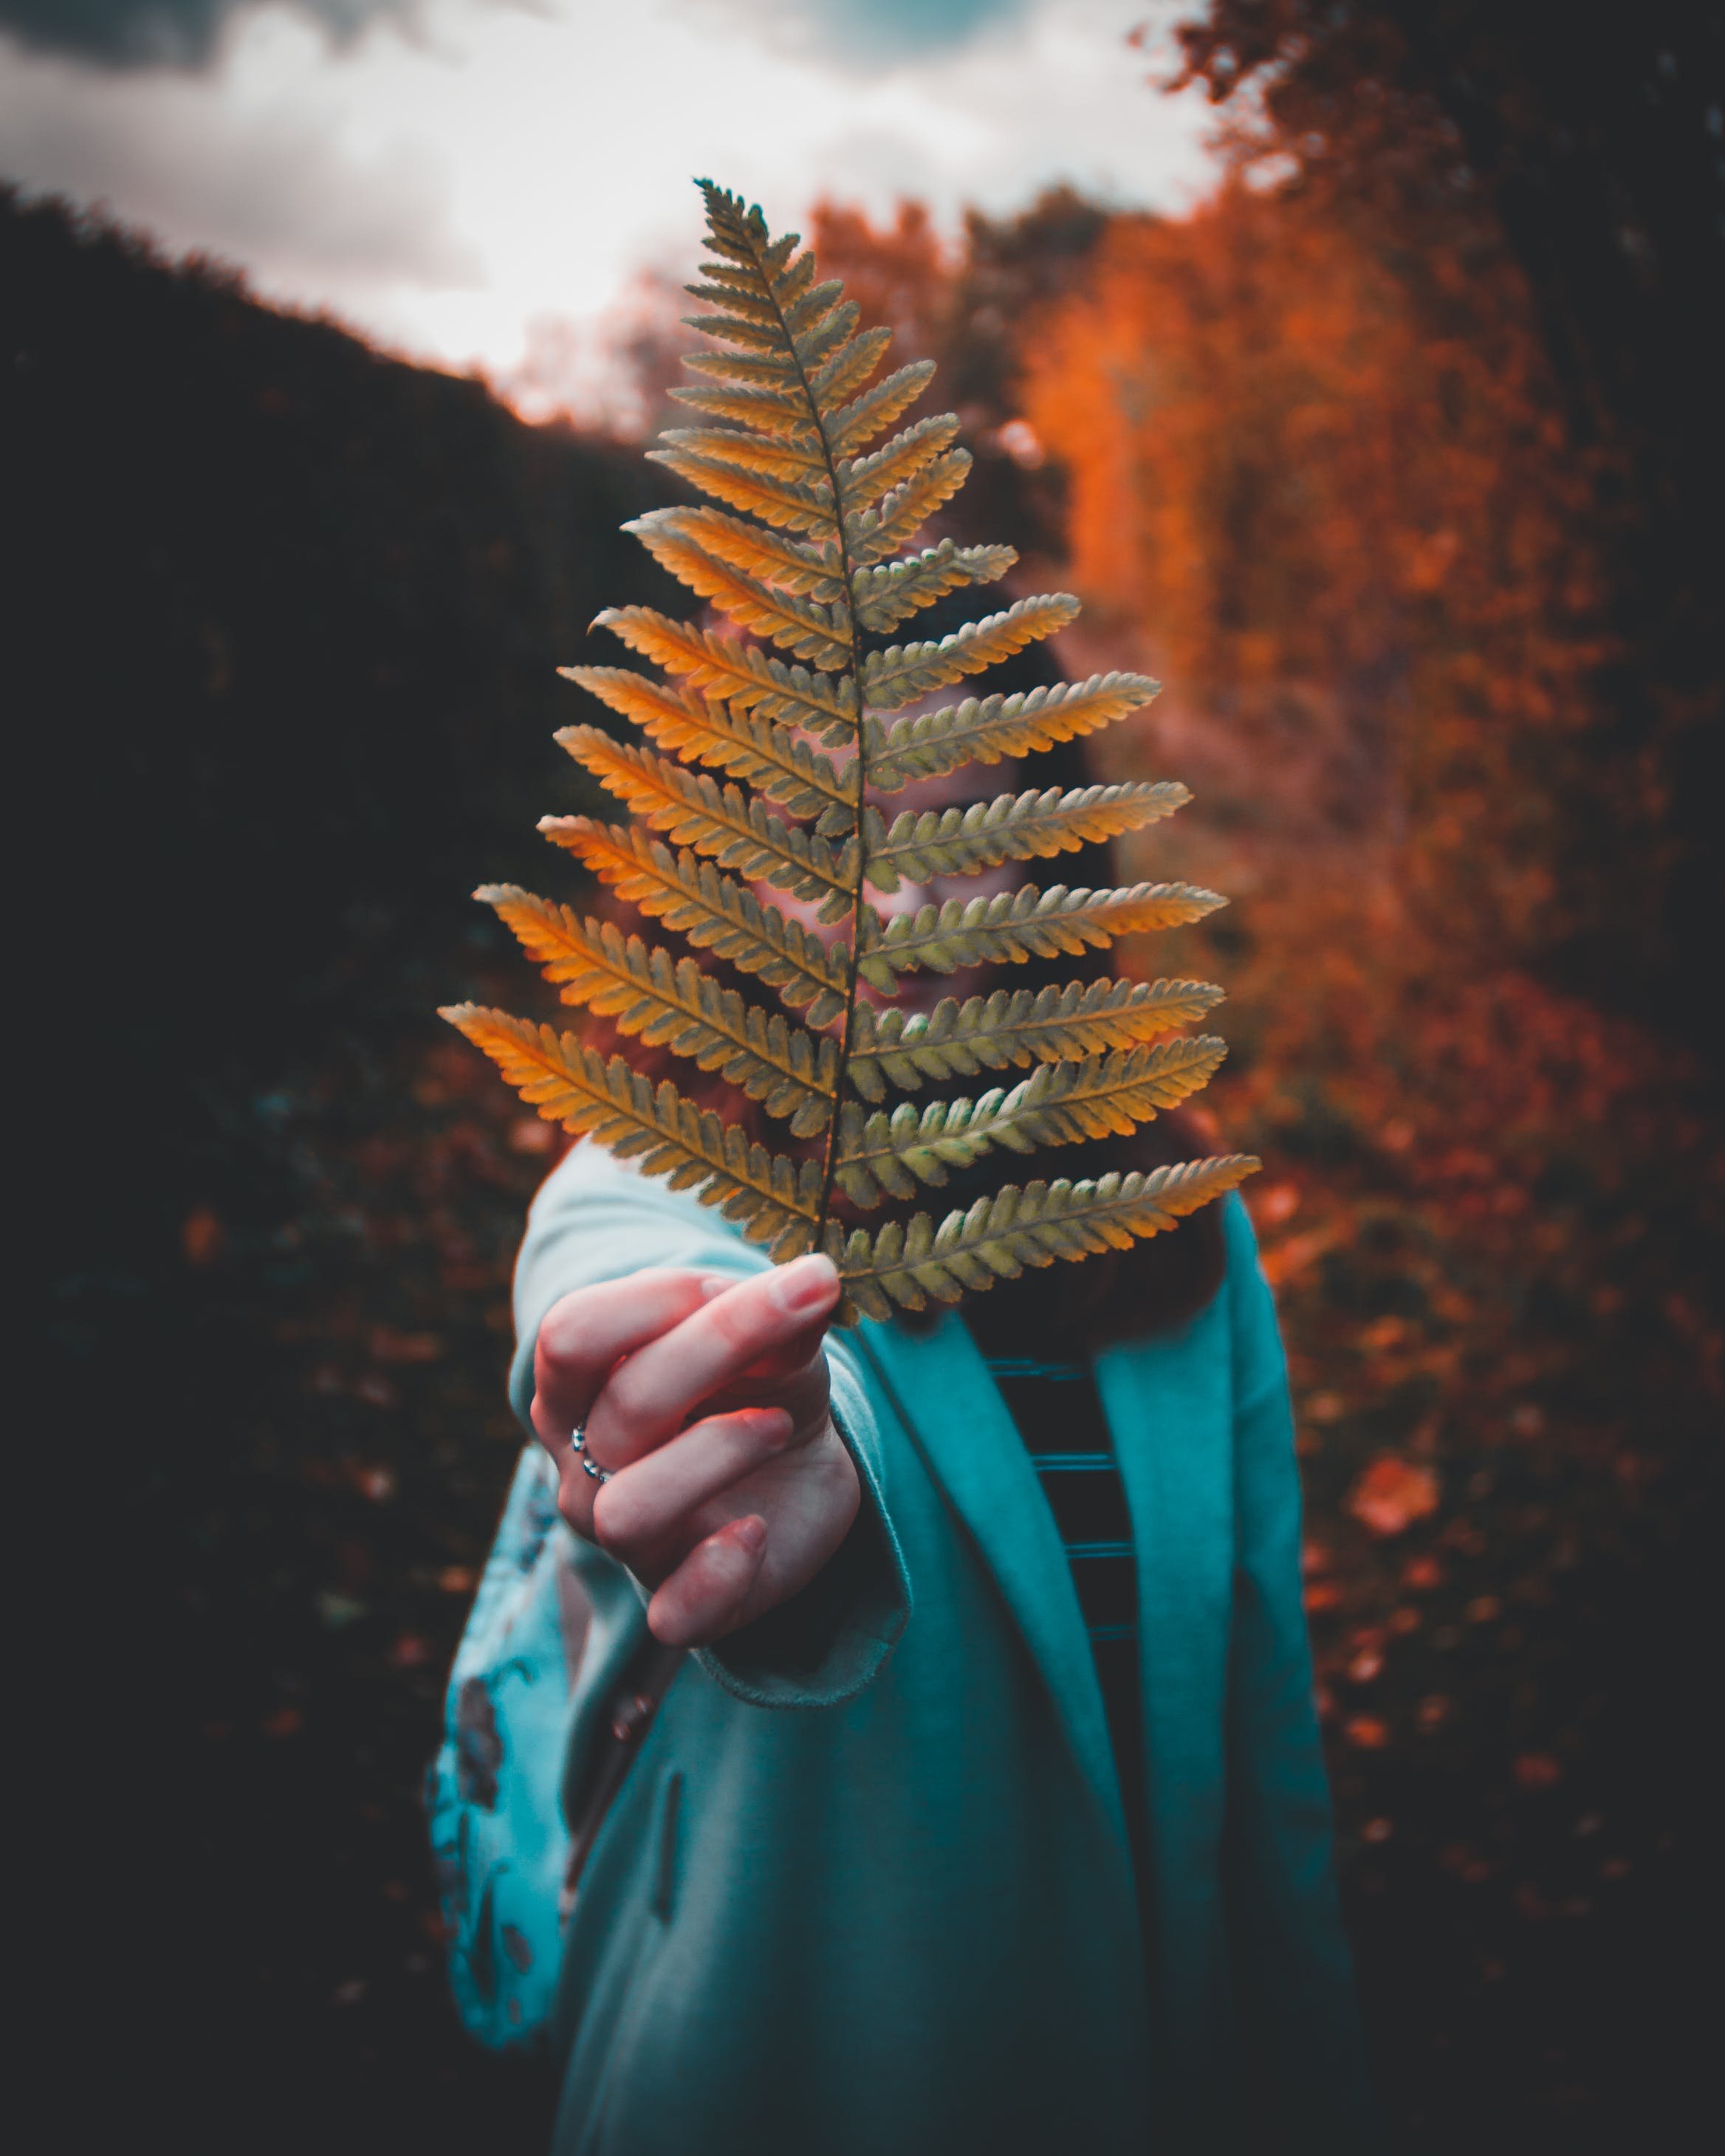 Kostenloses Stock Foto zu person, frau, hand, pflanze